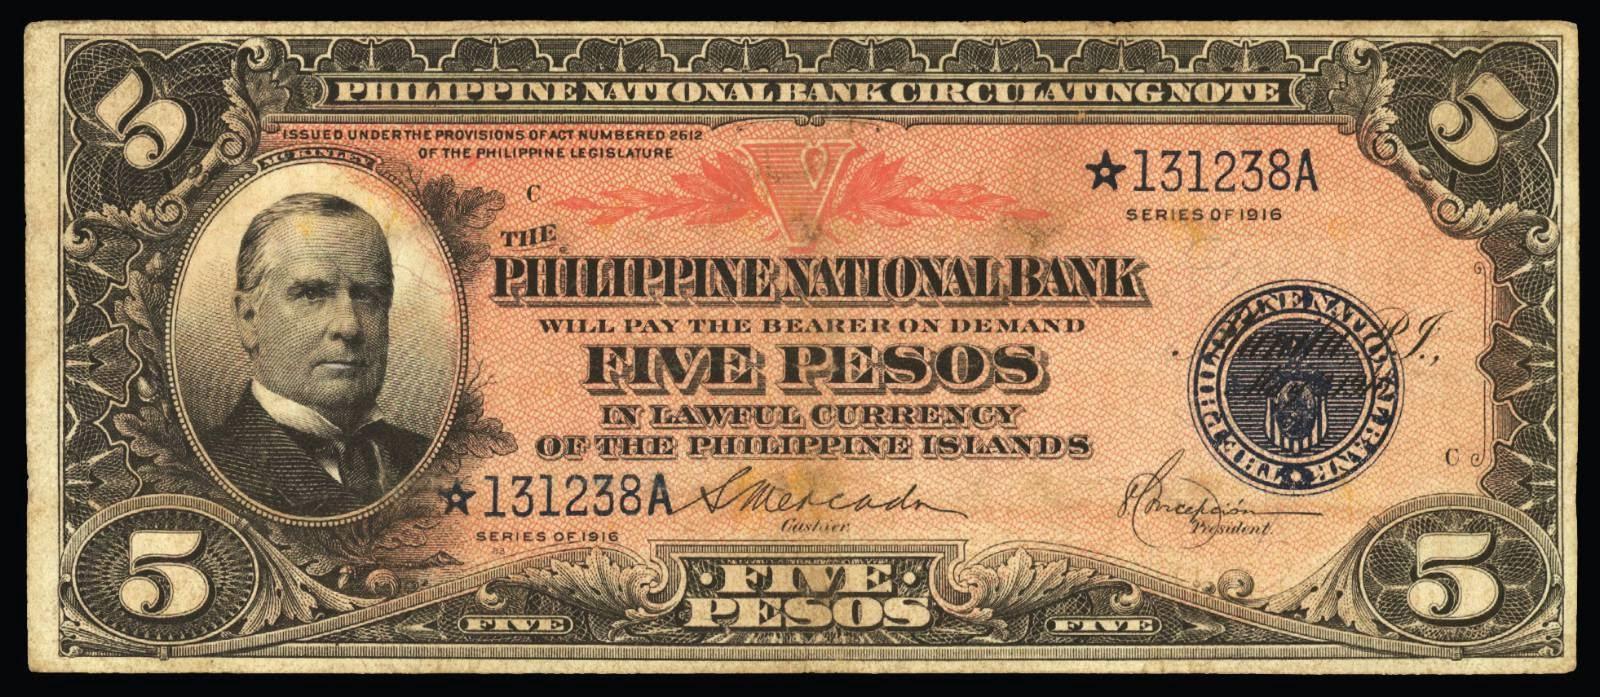 1916 philippine national bank five pesos circulating note president